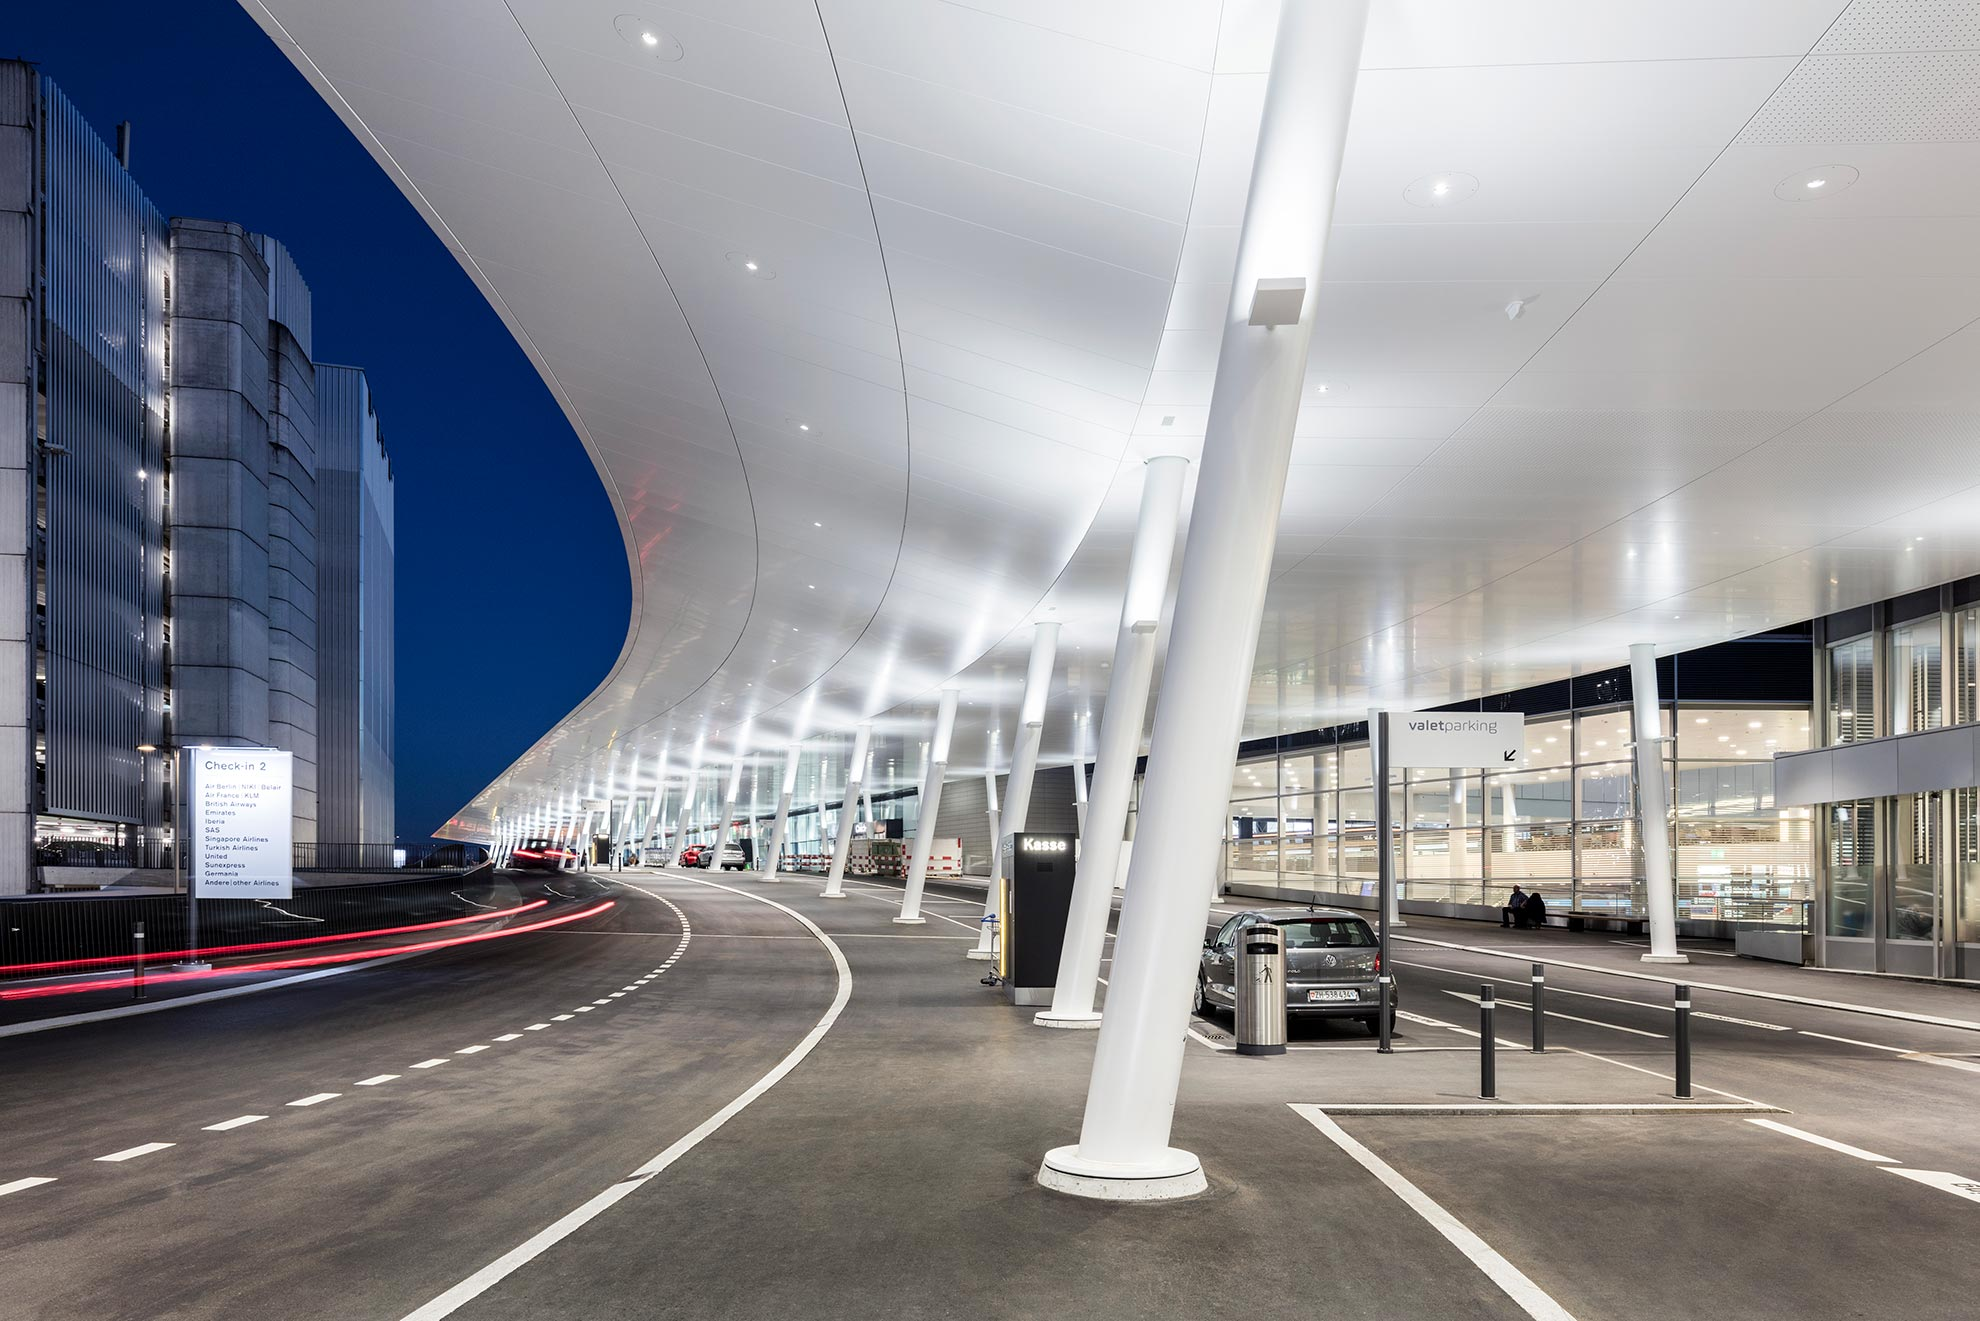 Aeropuerto-de-Zurich-Suiza.-Larcore-A2-20mm.-8000m2-3_1592296972.jpg